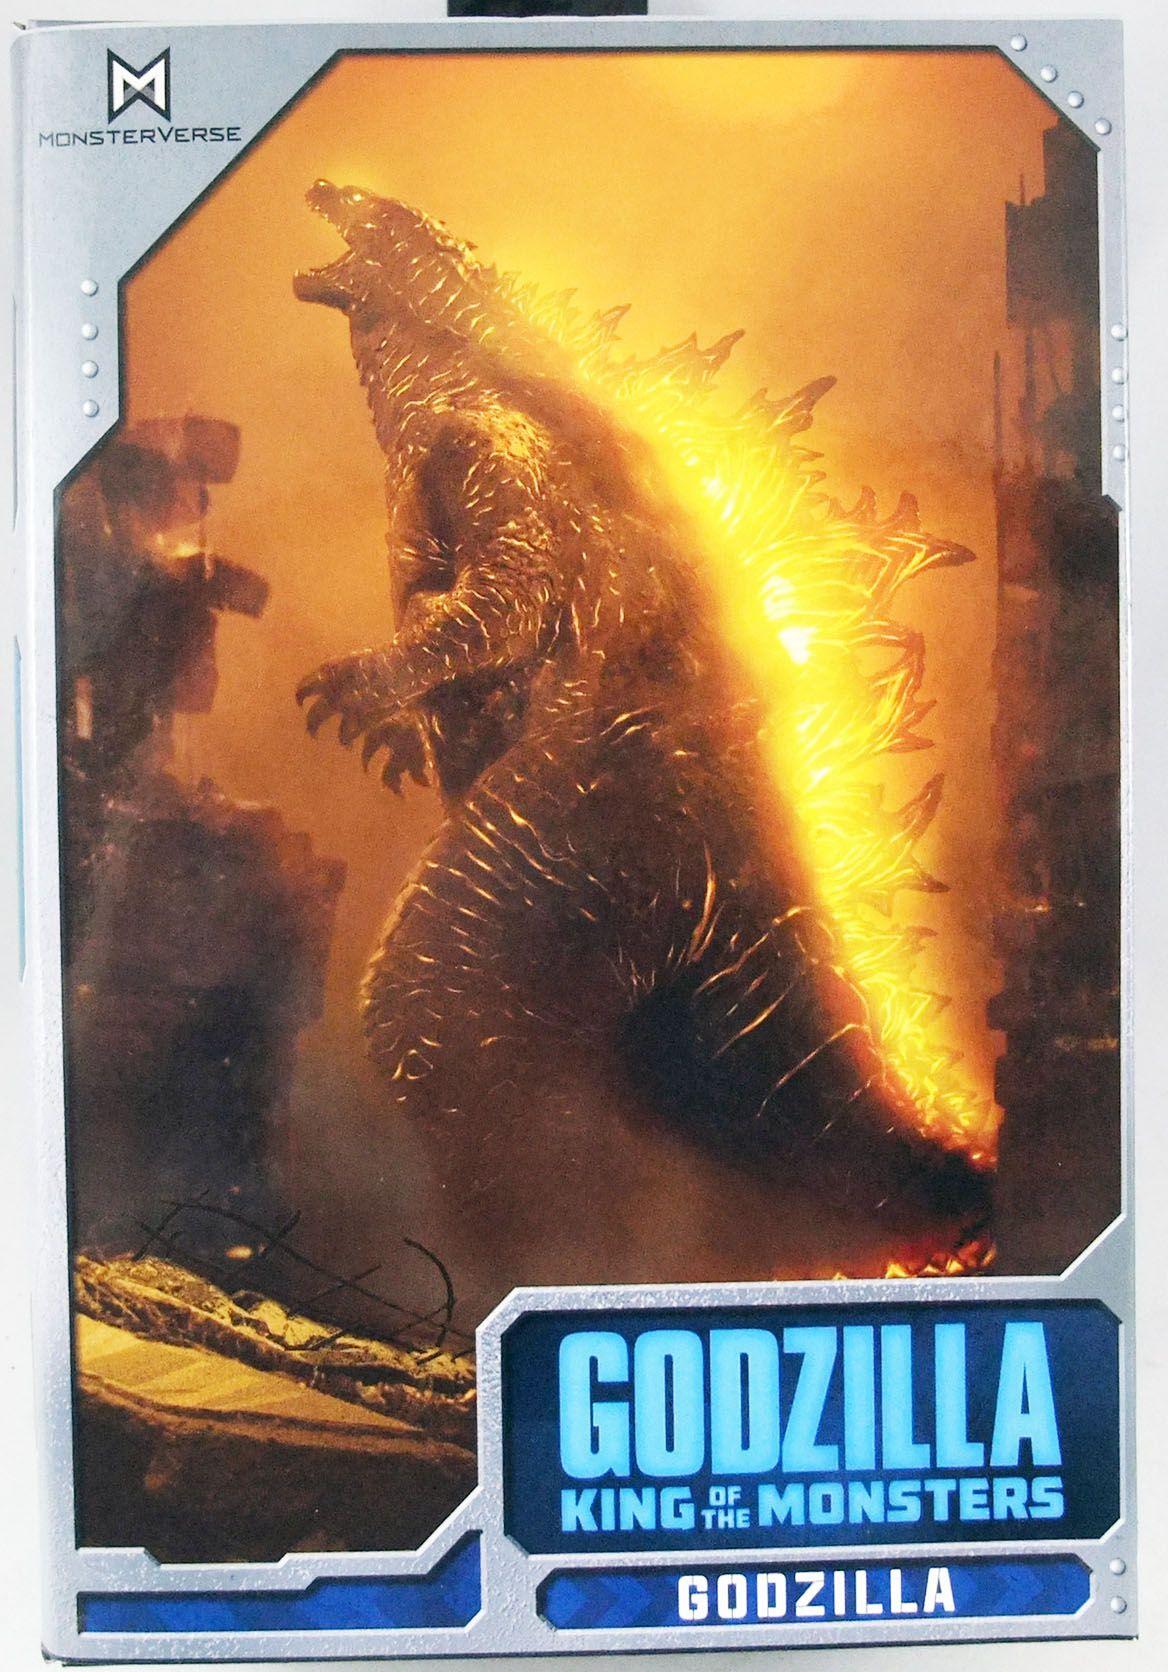 Godzilla King Of The Monsters 2019 Neca Burning Godzilla 7 Action Figure